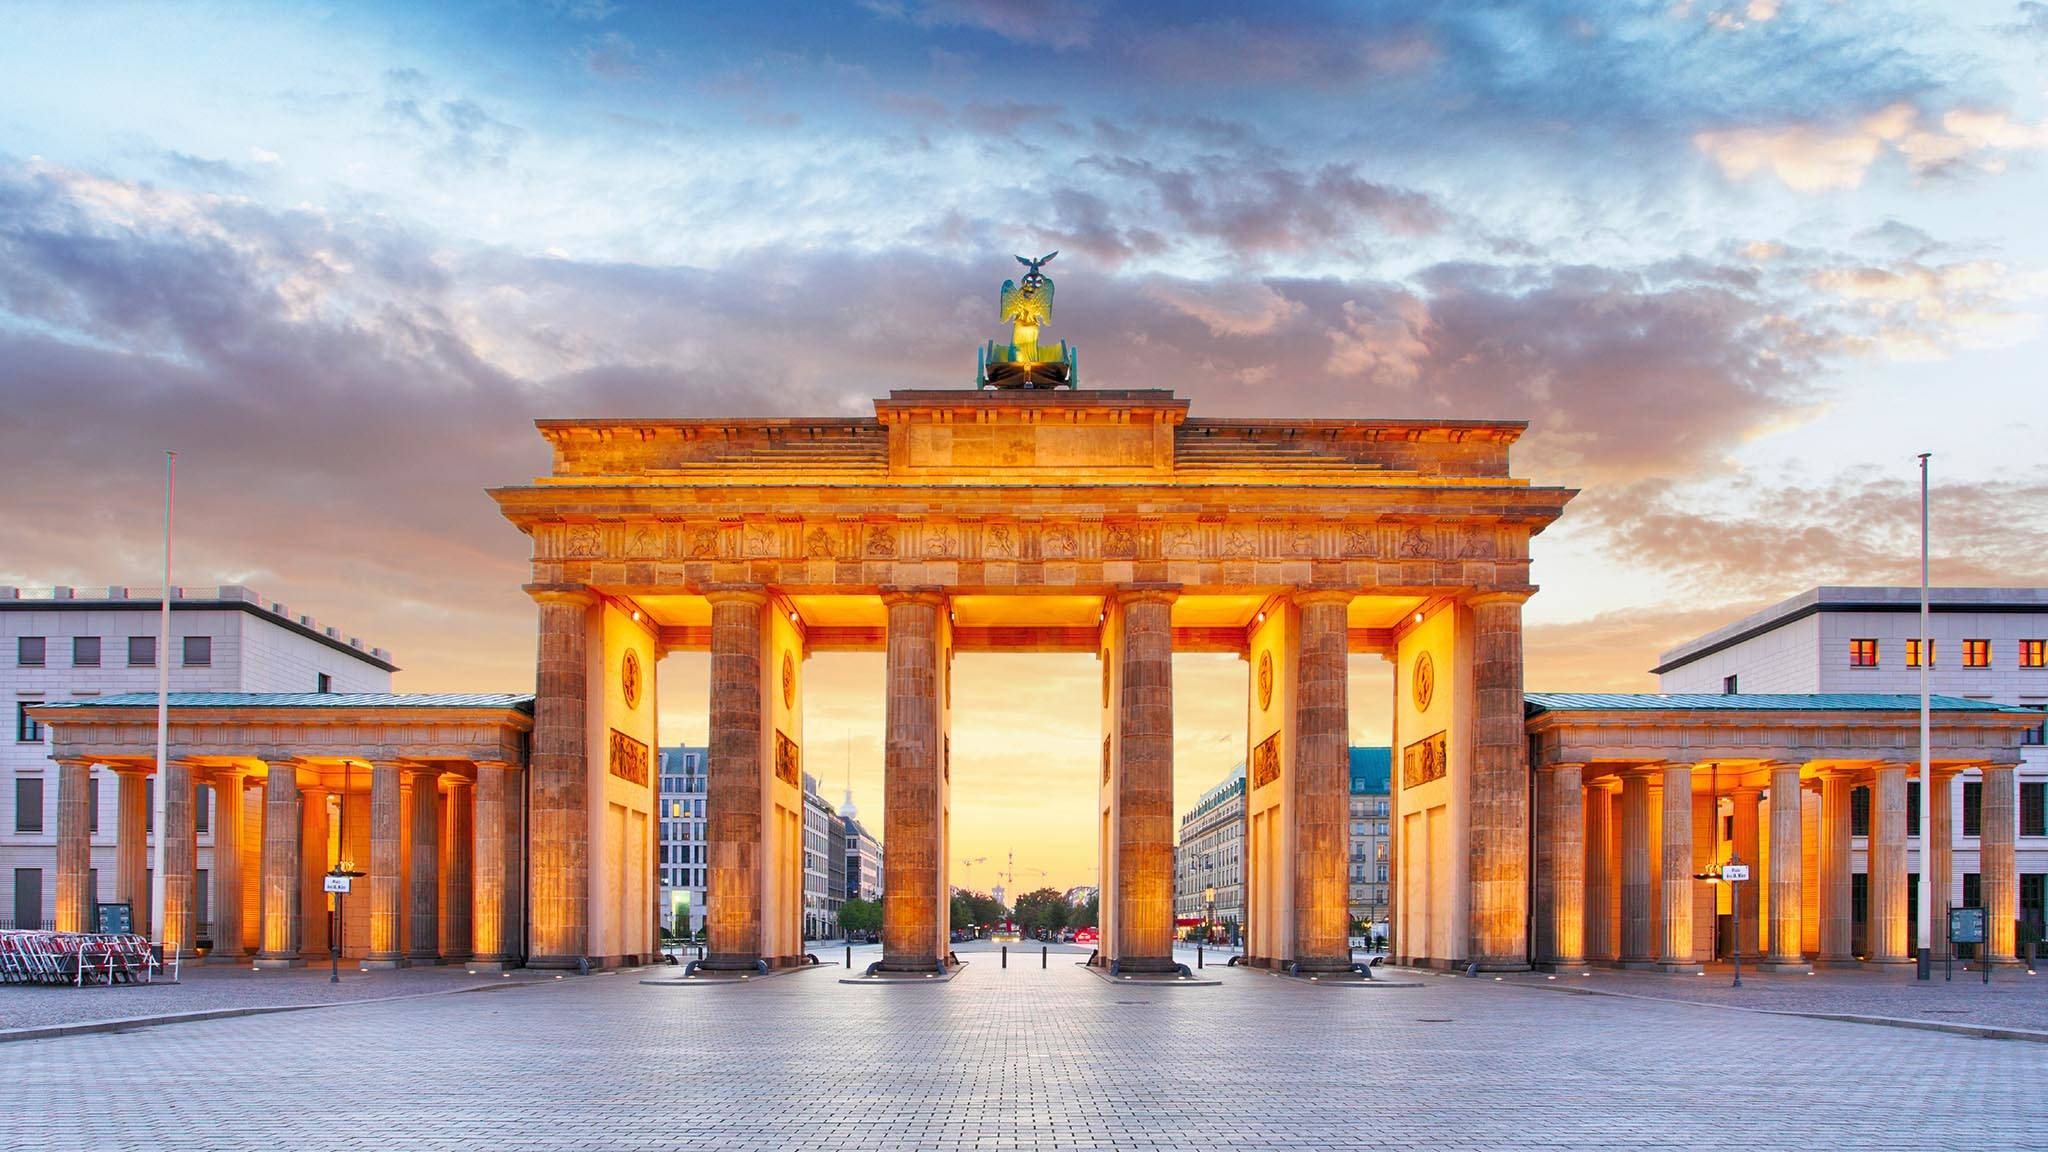 Public Transport In Germany Internations Brandenburg Gate Germany Berlin City